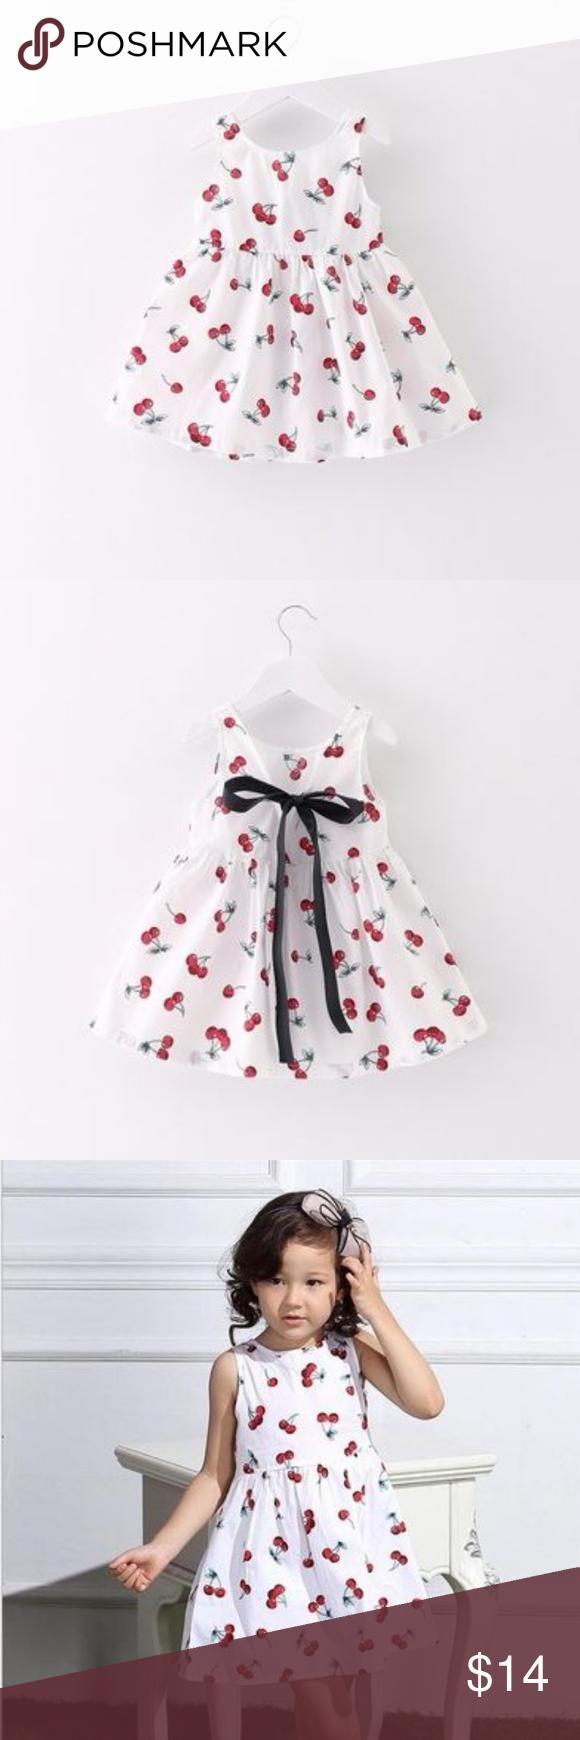 Baby Girl White Cherries Dress 12 18 Mo Cherry Dress Toddler Dress Dress Cover [ 1740 x 580 Pixel ]